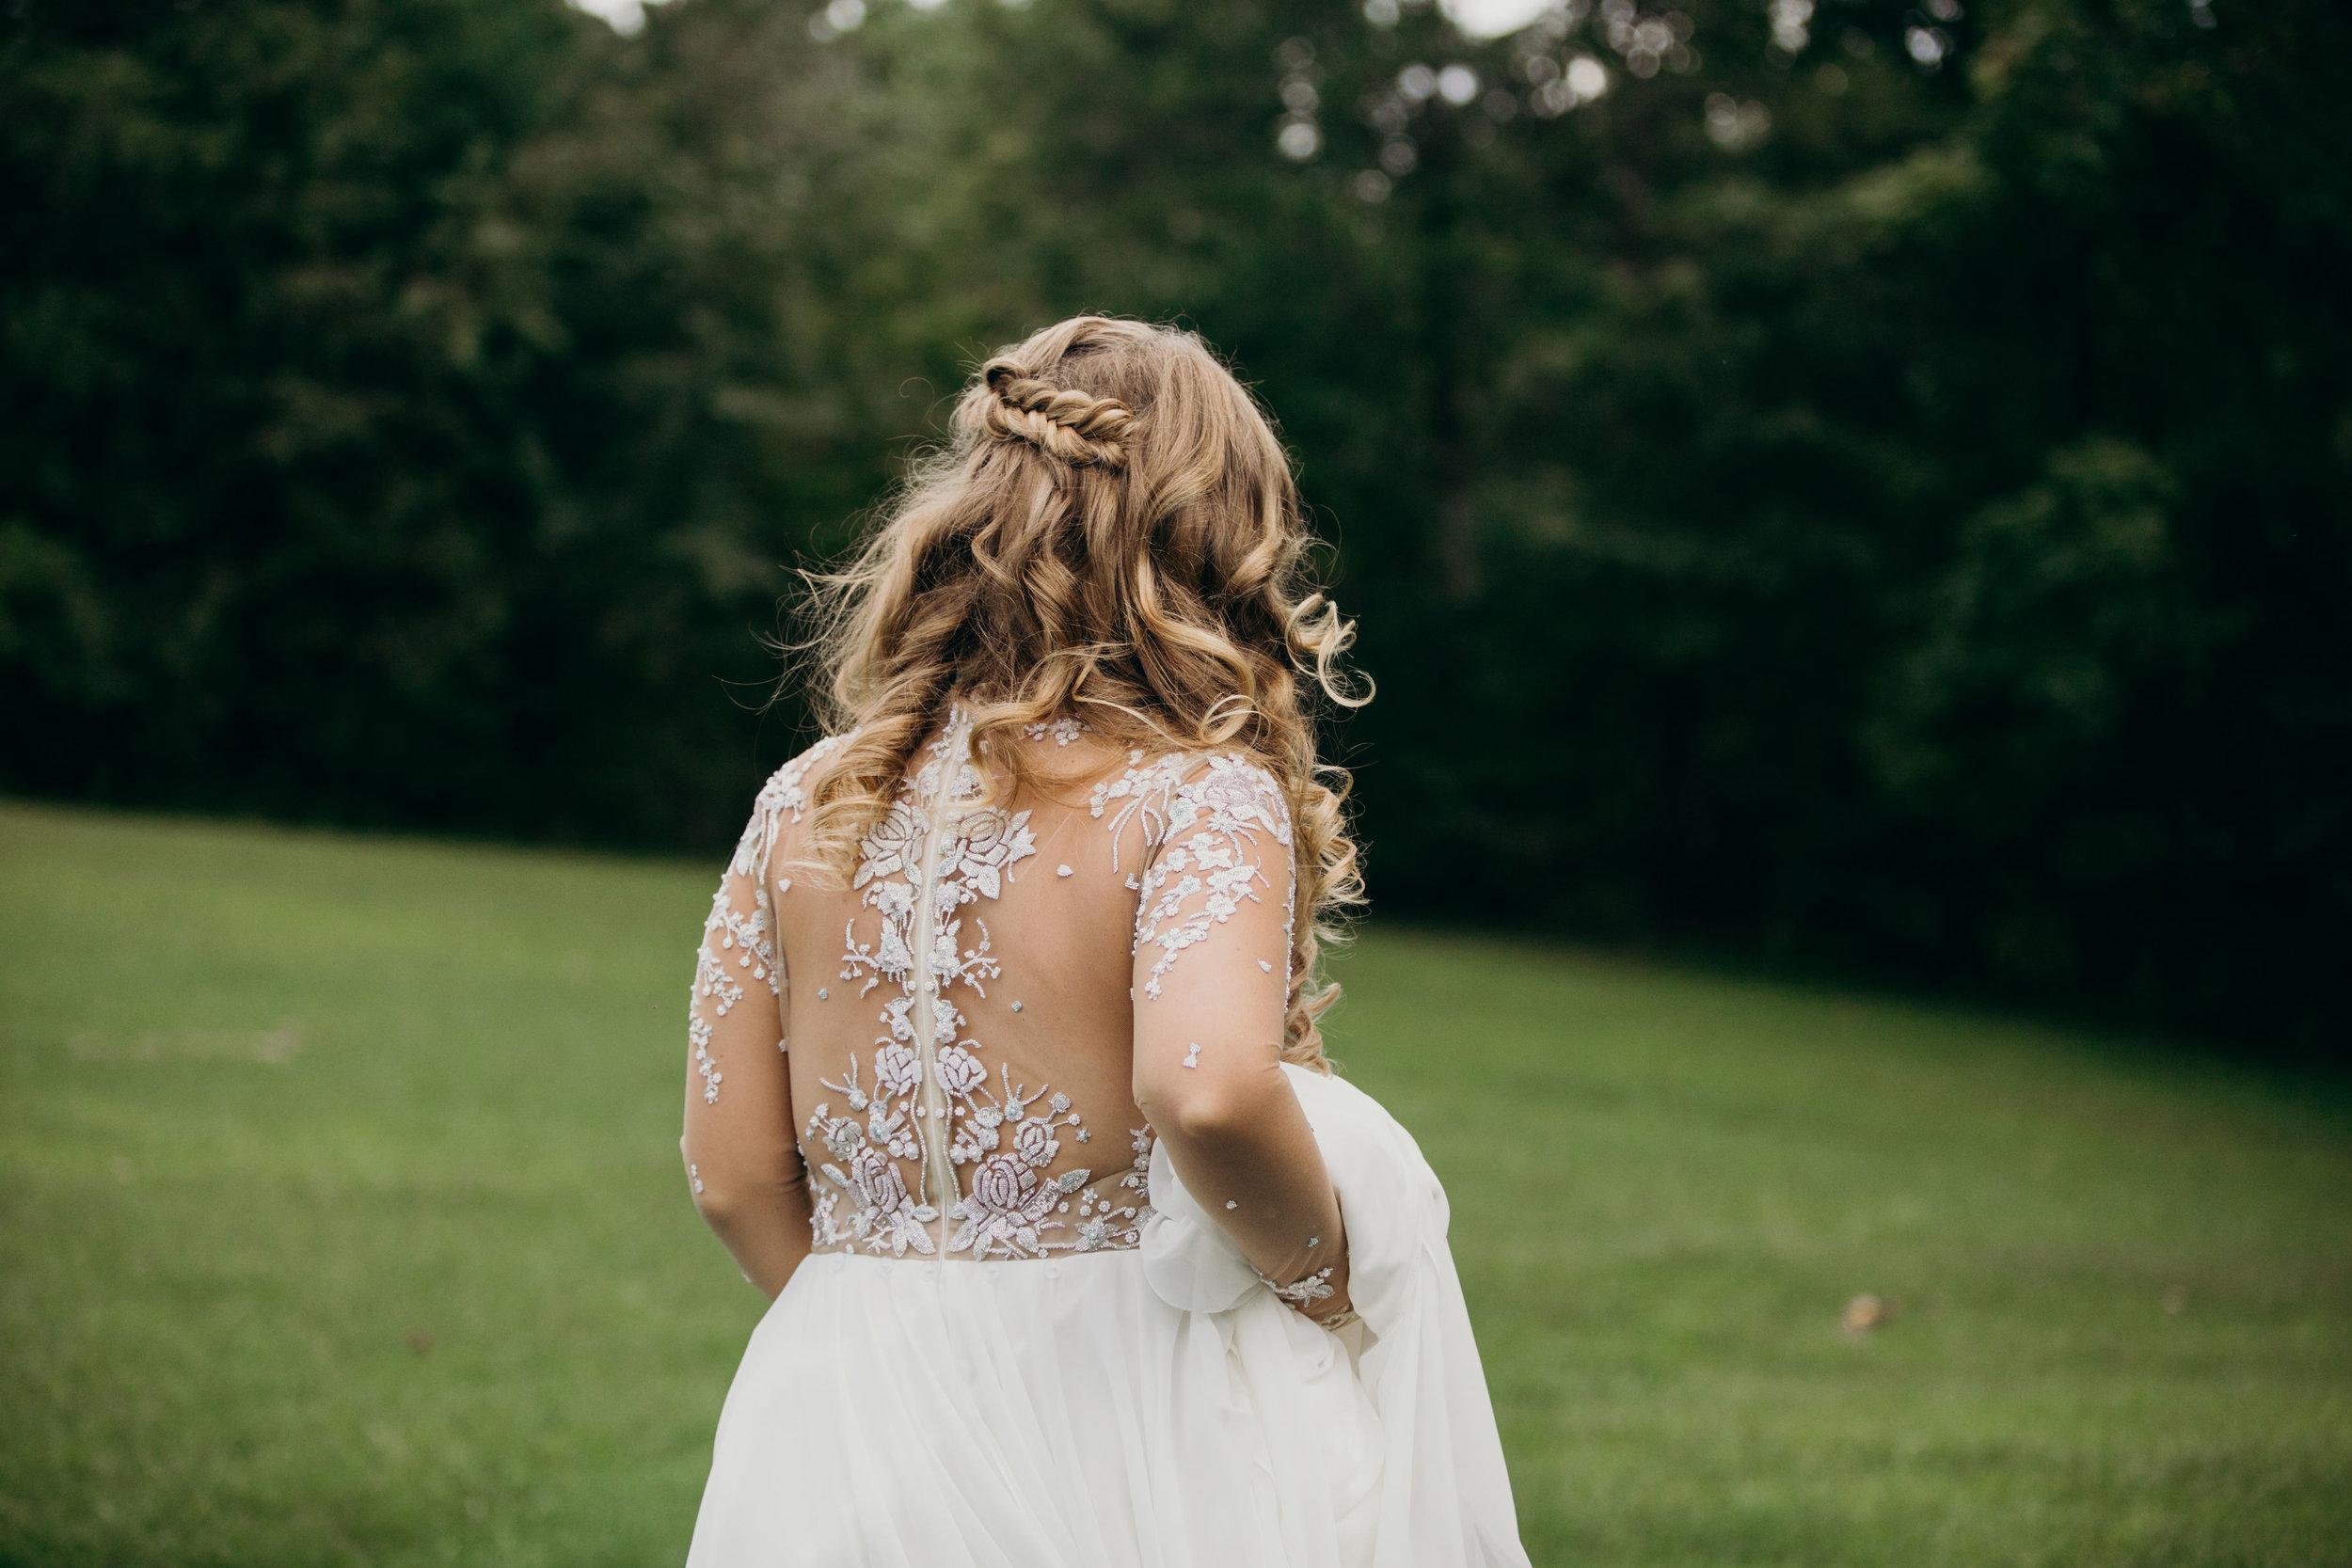 ryan-lauren-wedding-at-montfair-resort-farm-lindsey-paradiso-photography-8725.jpg